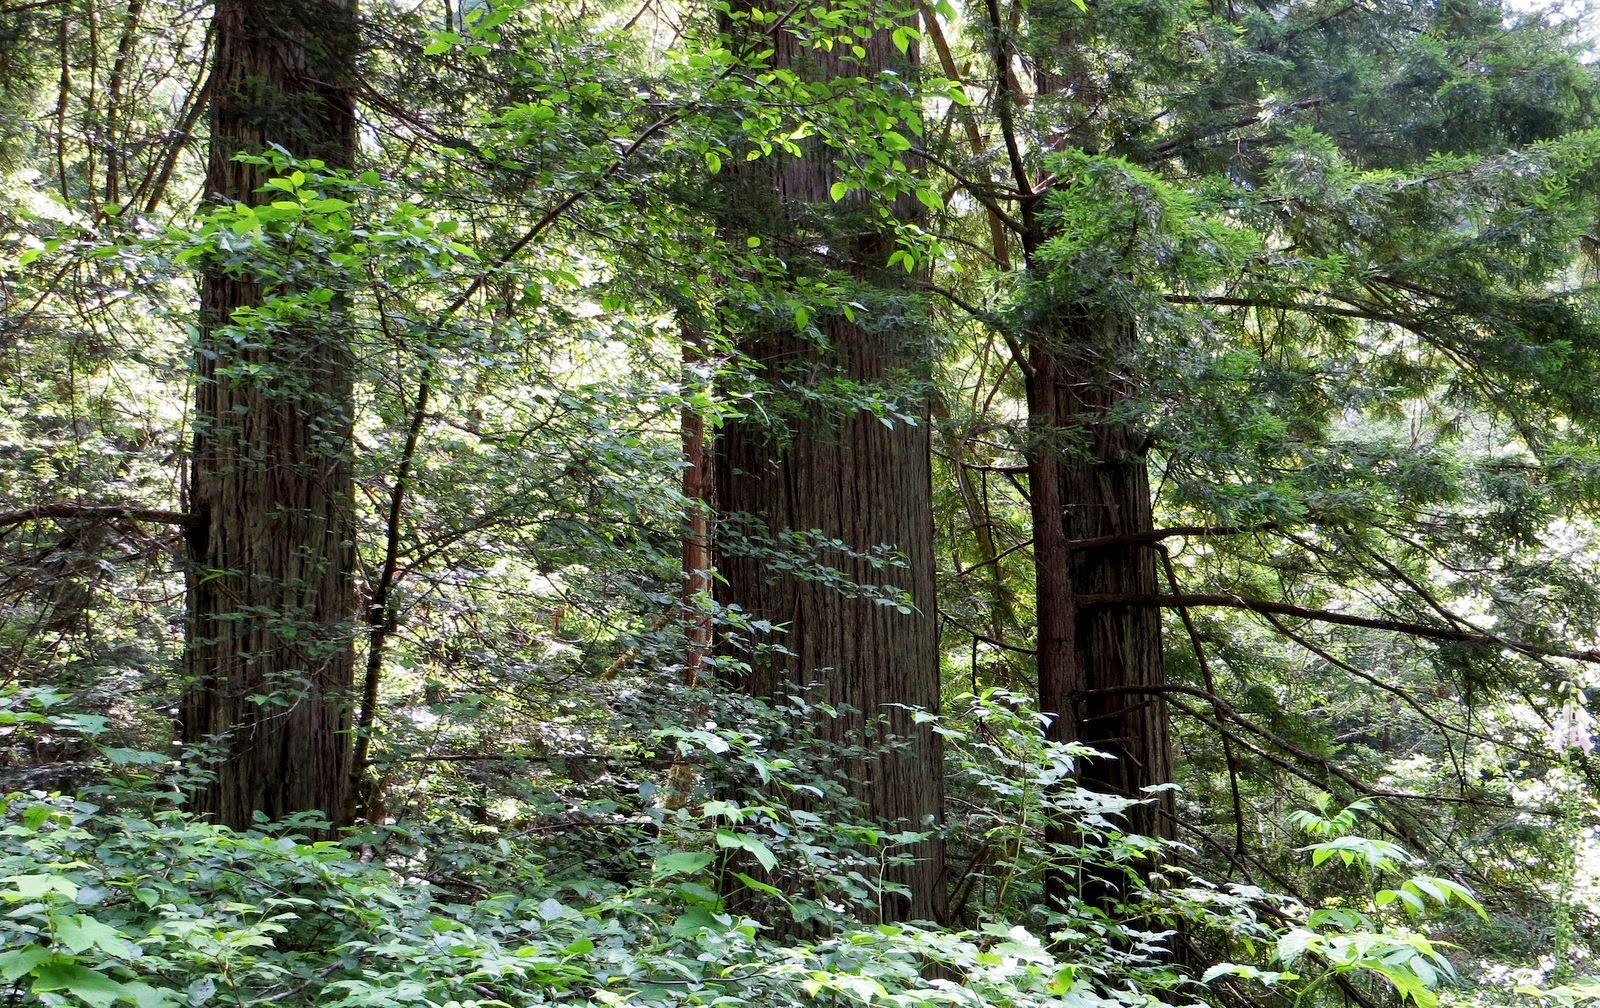 Candy N John Rv 2013 July Giant Redwood National Park